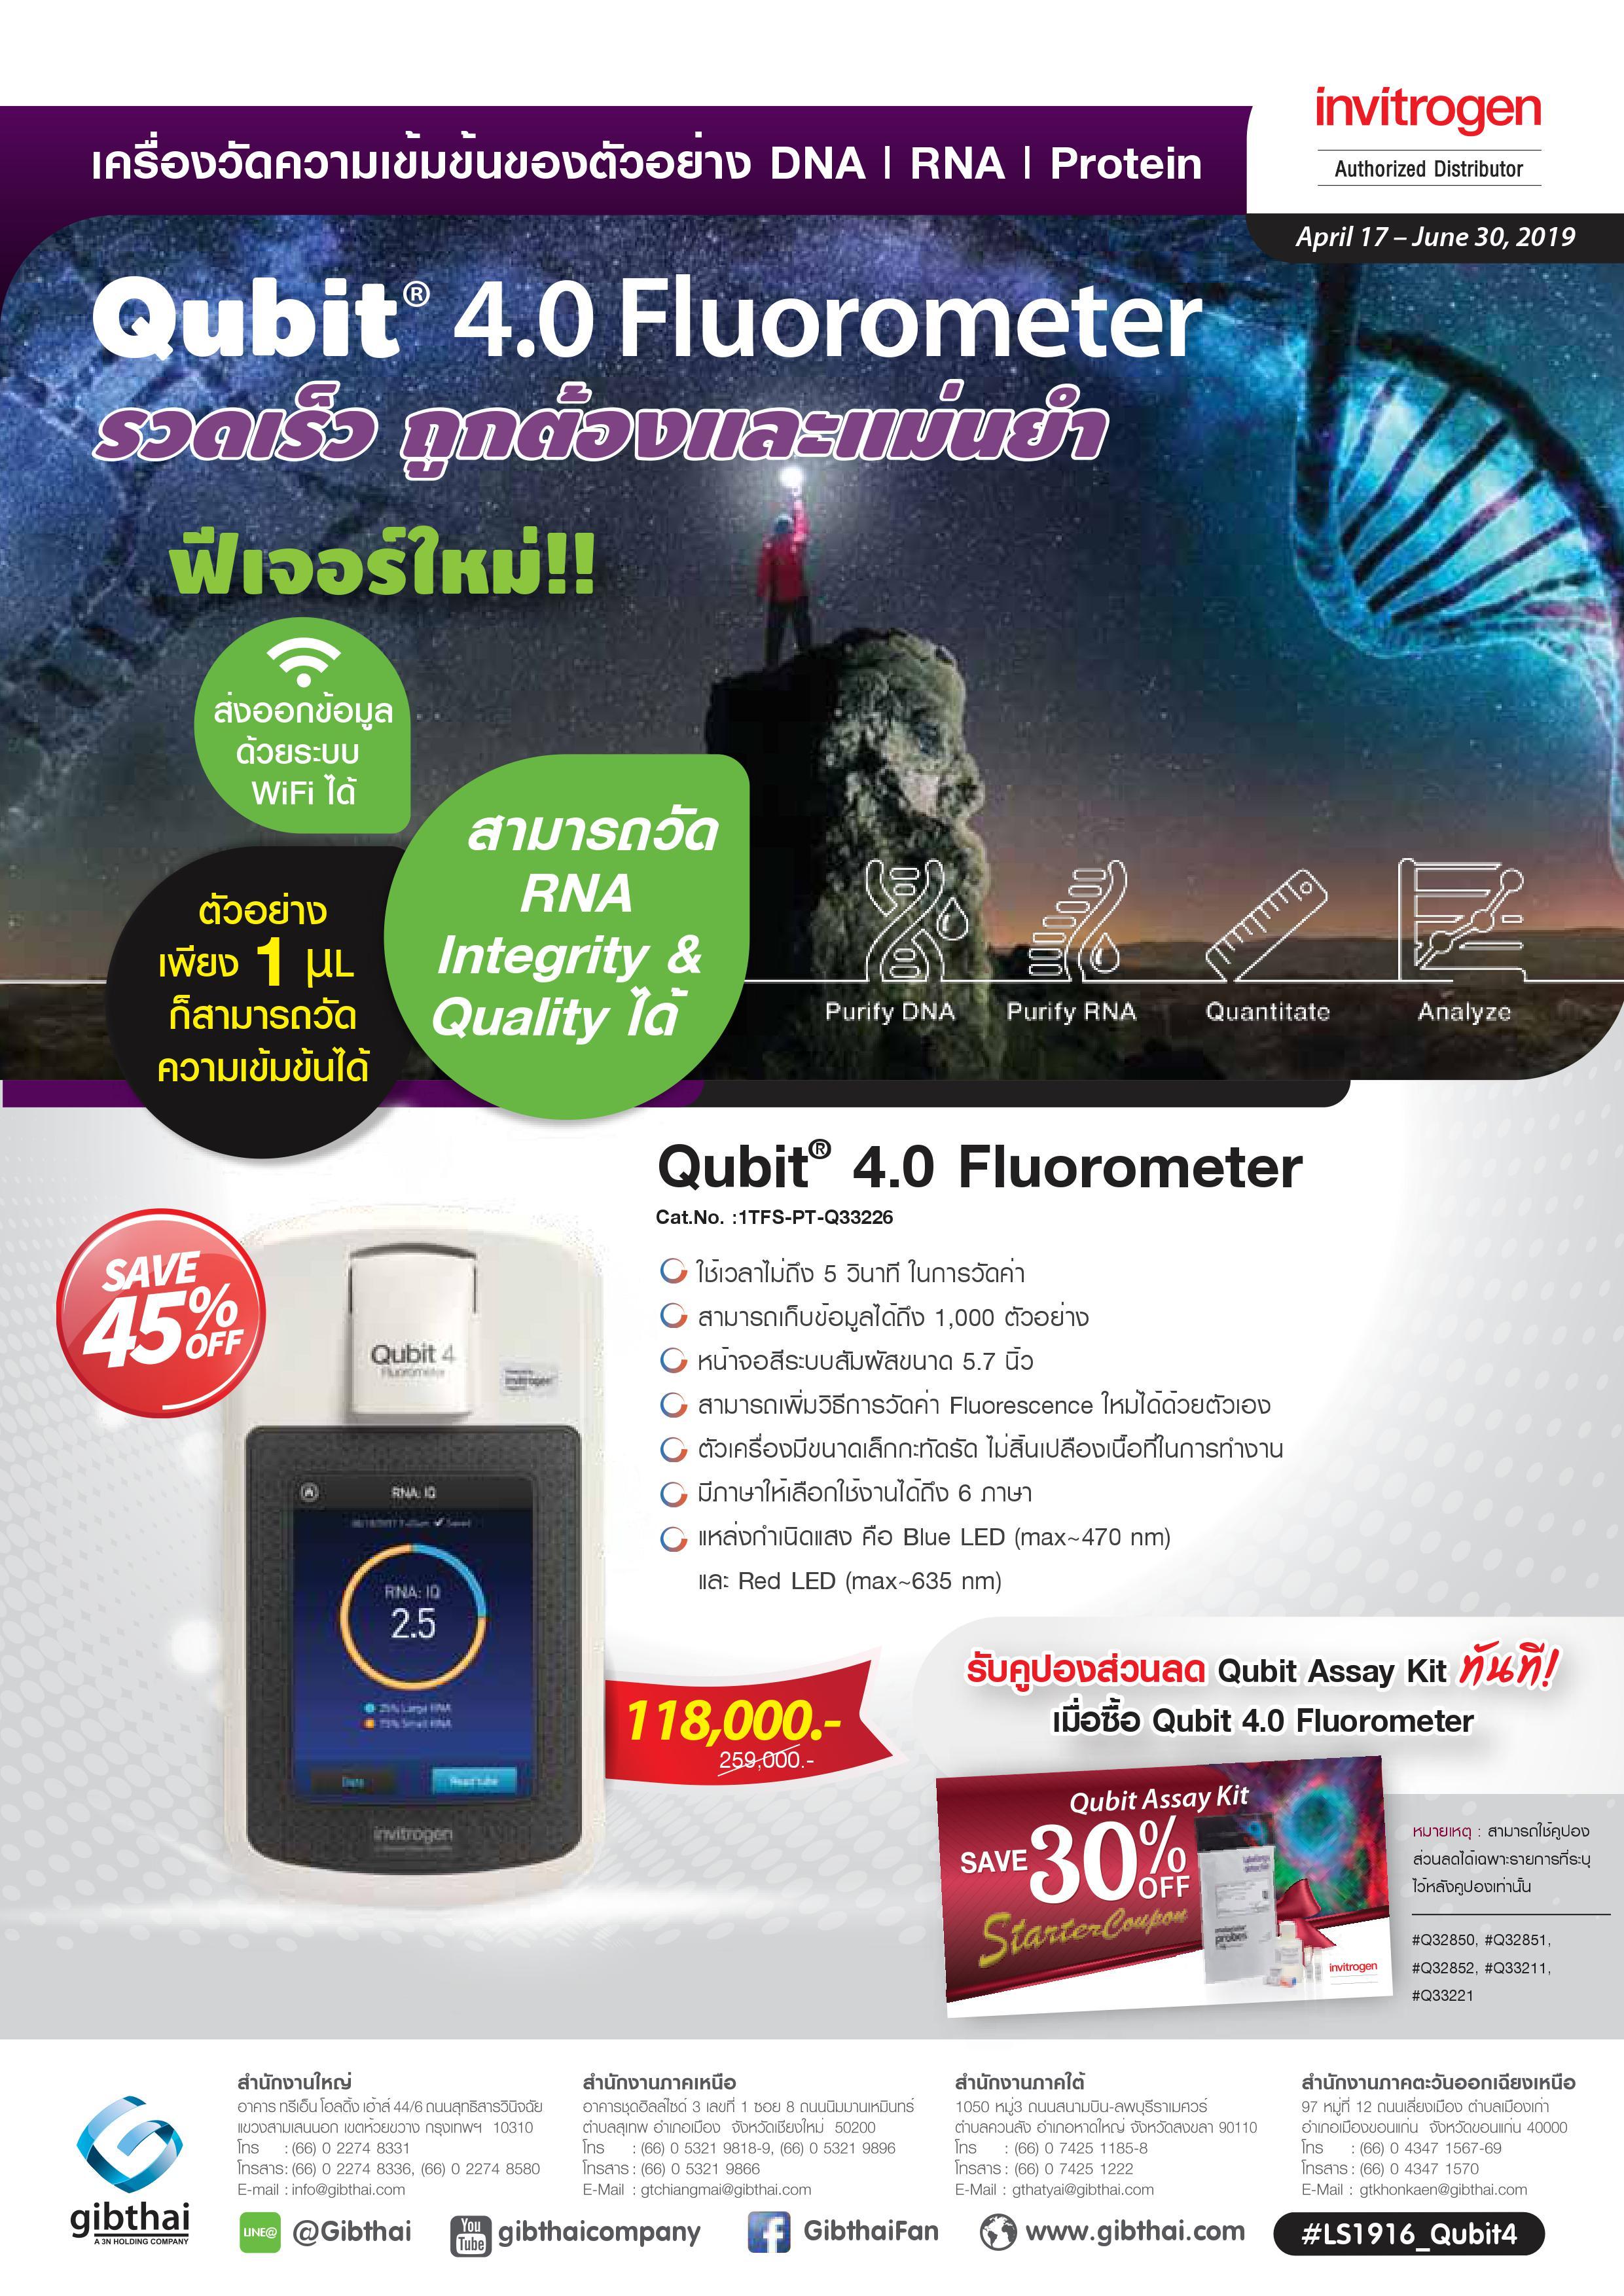 Qubit® 4.0 Fluorometer